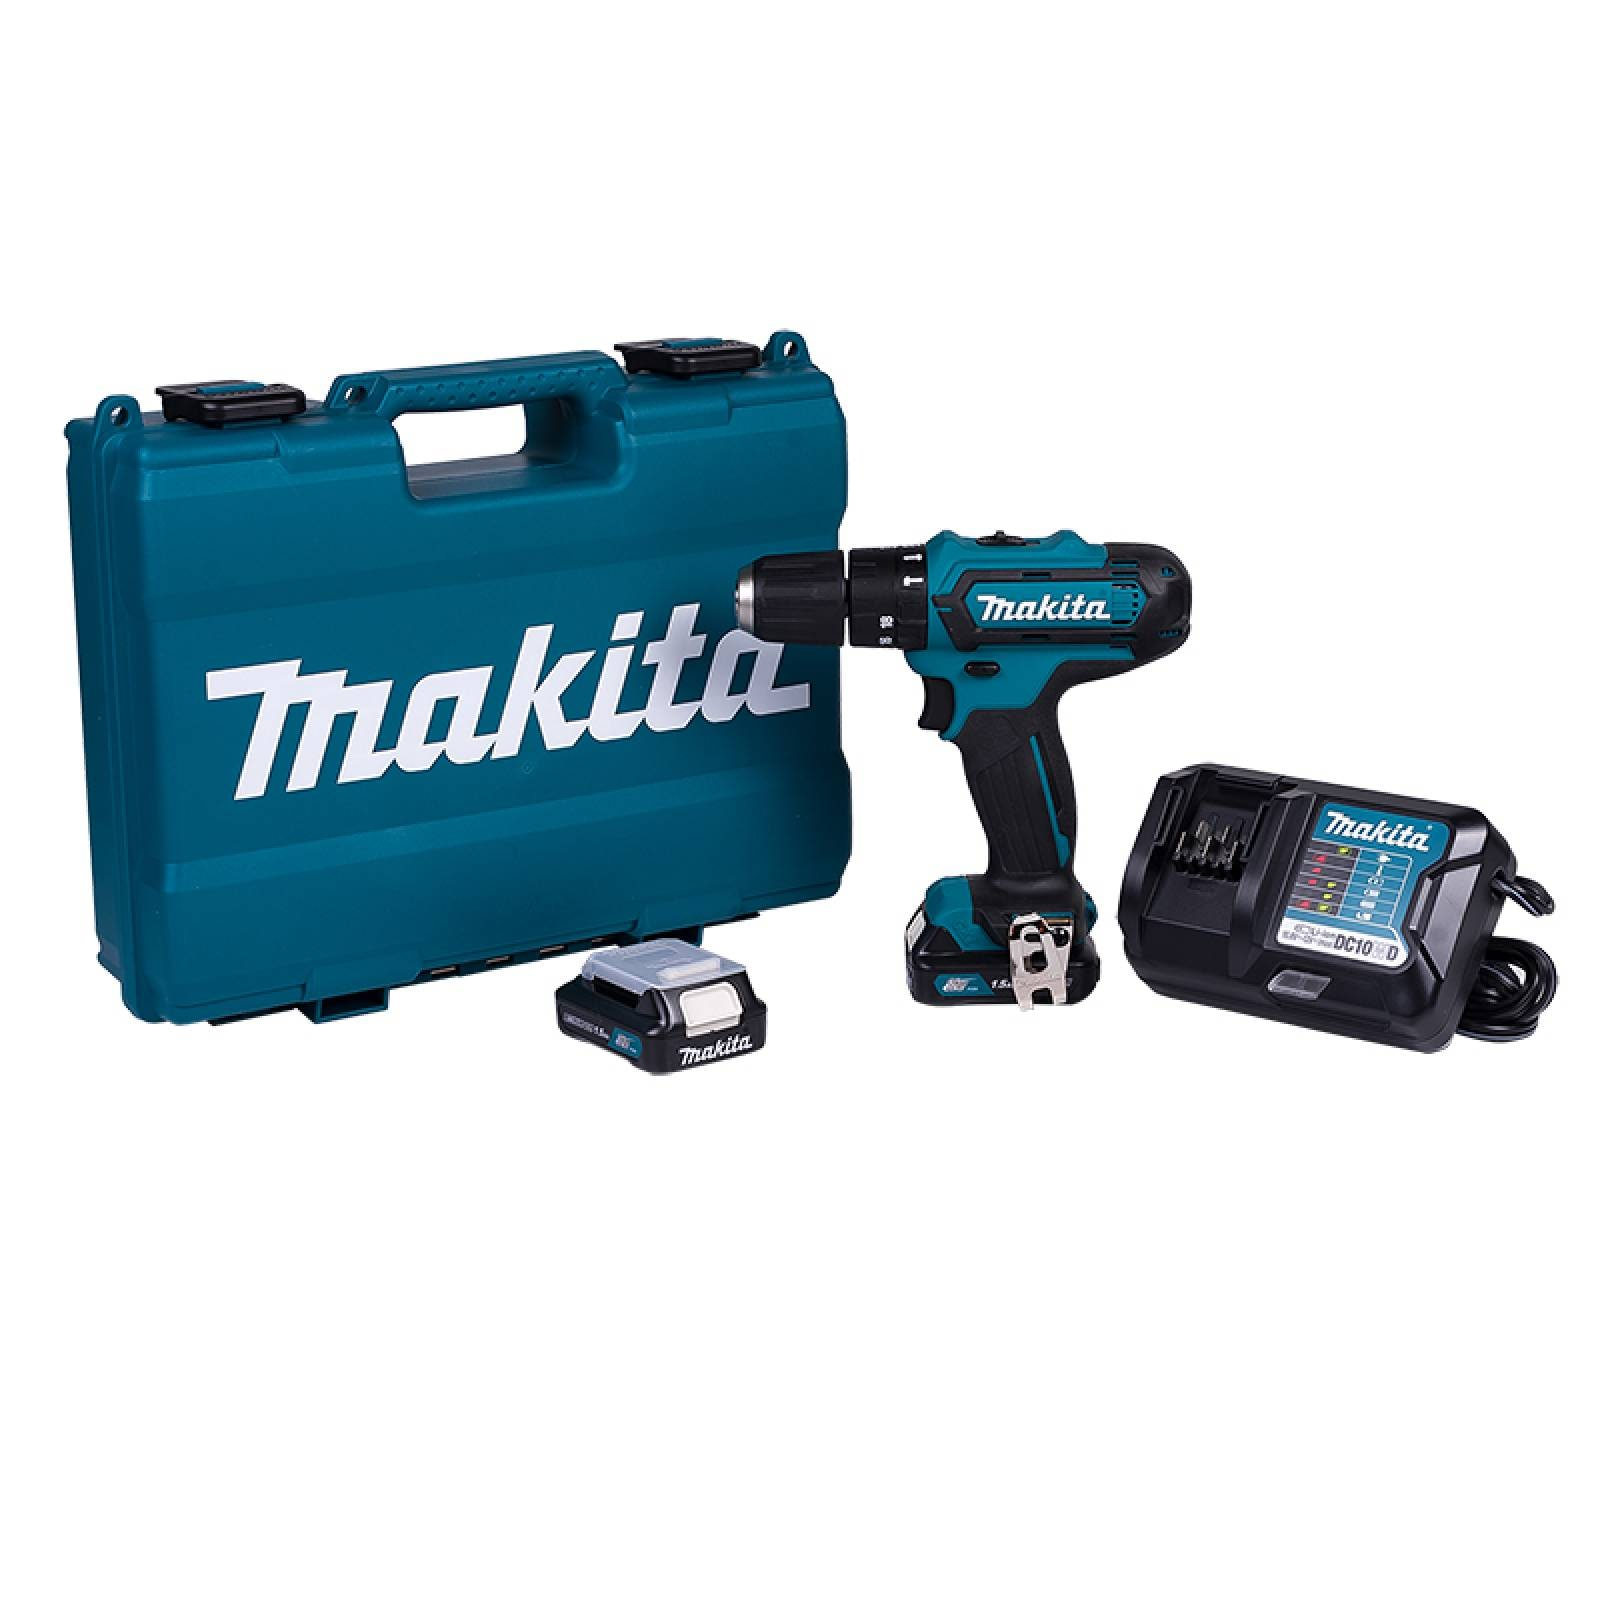 Rotomartillo Makita Taladro 2V 3/8 HP331D Makita